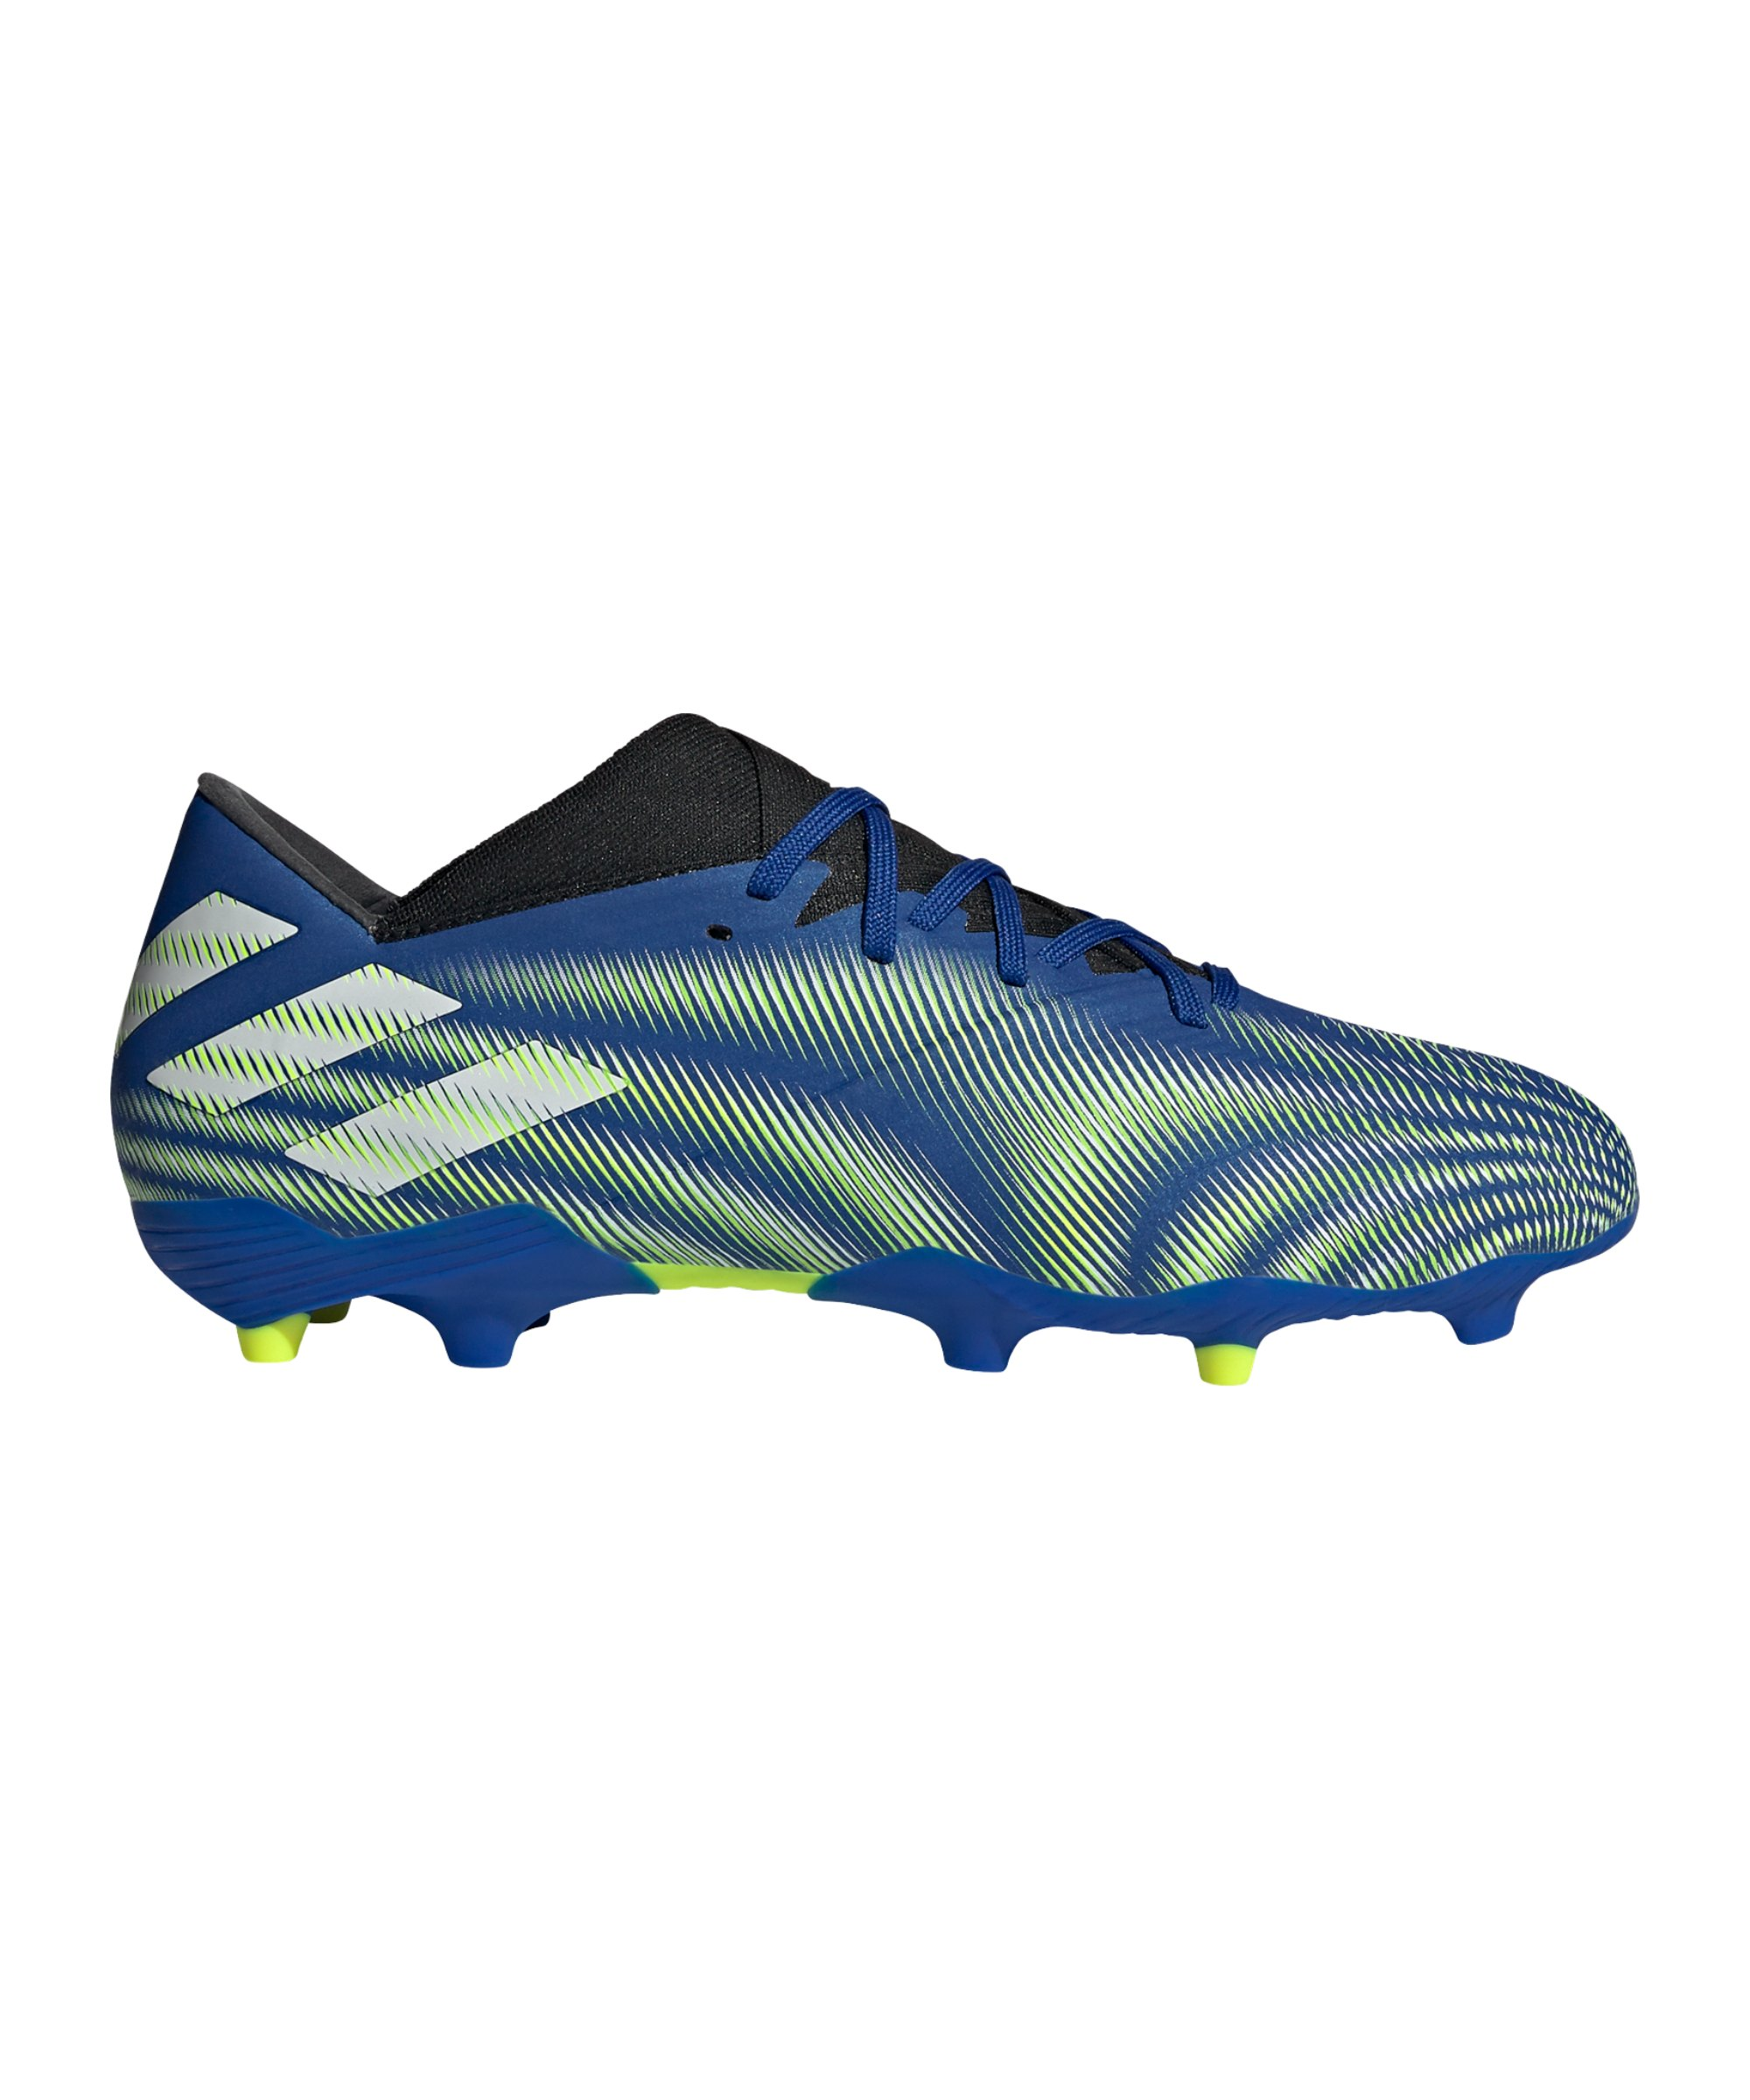 adidas NEMEZIZ.2 FG Superlative Blau Gelb Weiss - blau